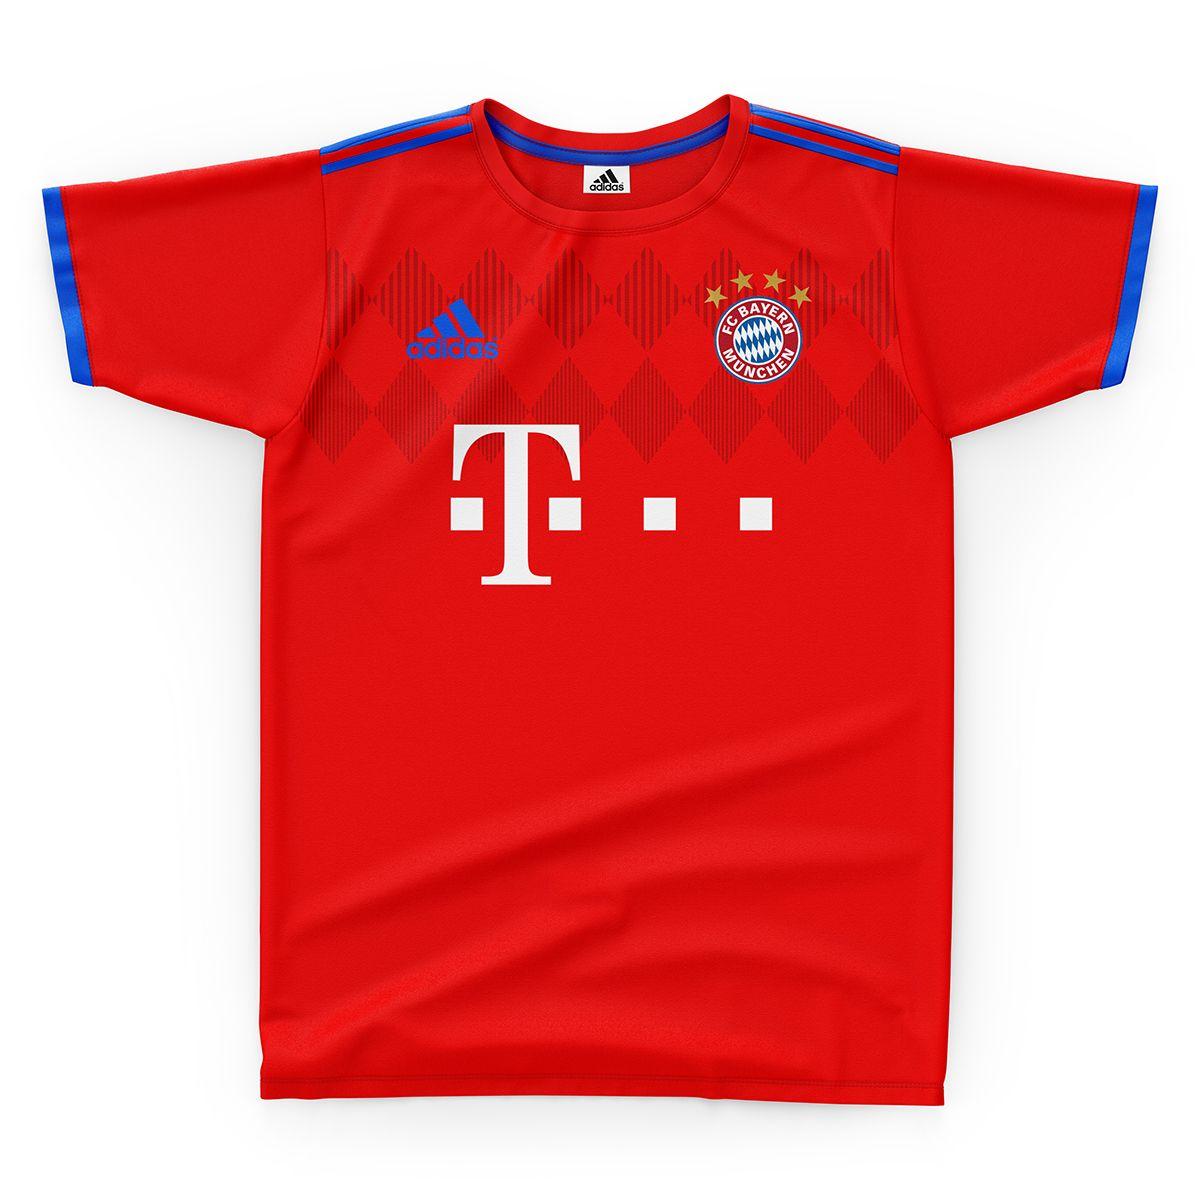 4711fede5 Fc Bayern Munchen Football Kit 18/19. on Behance | Football clubs ...